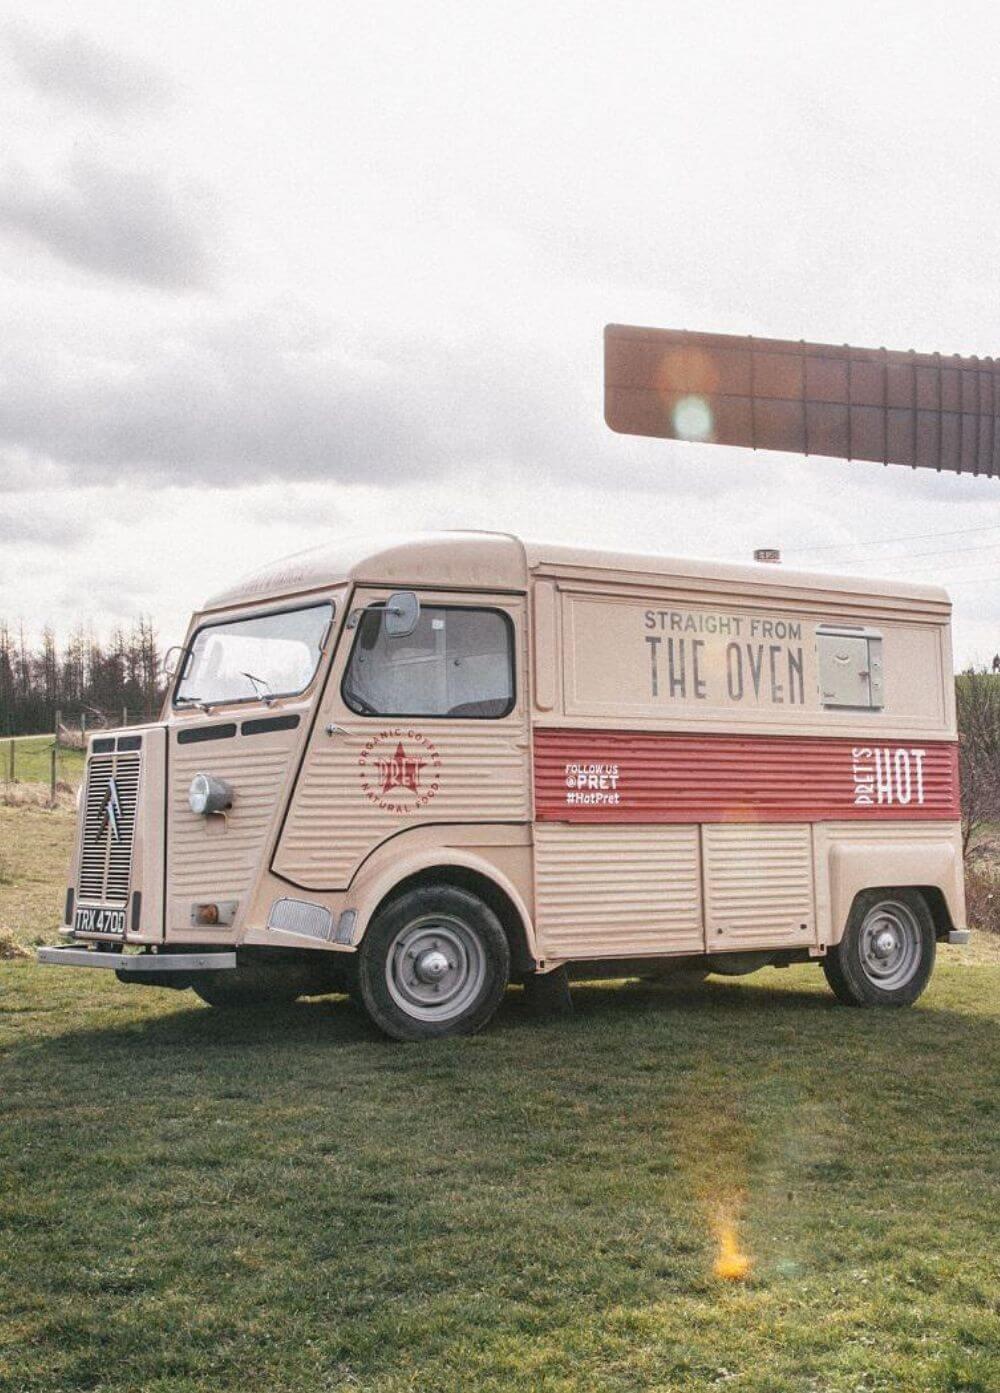 Promotional vehicle hire - H0van for Pret a Manger